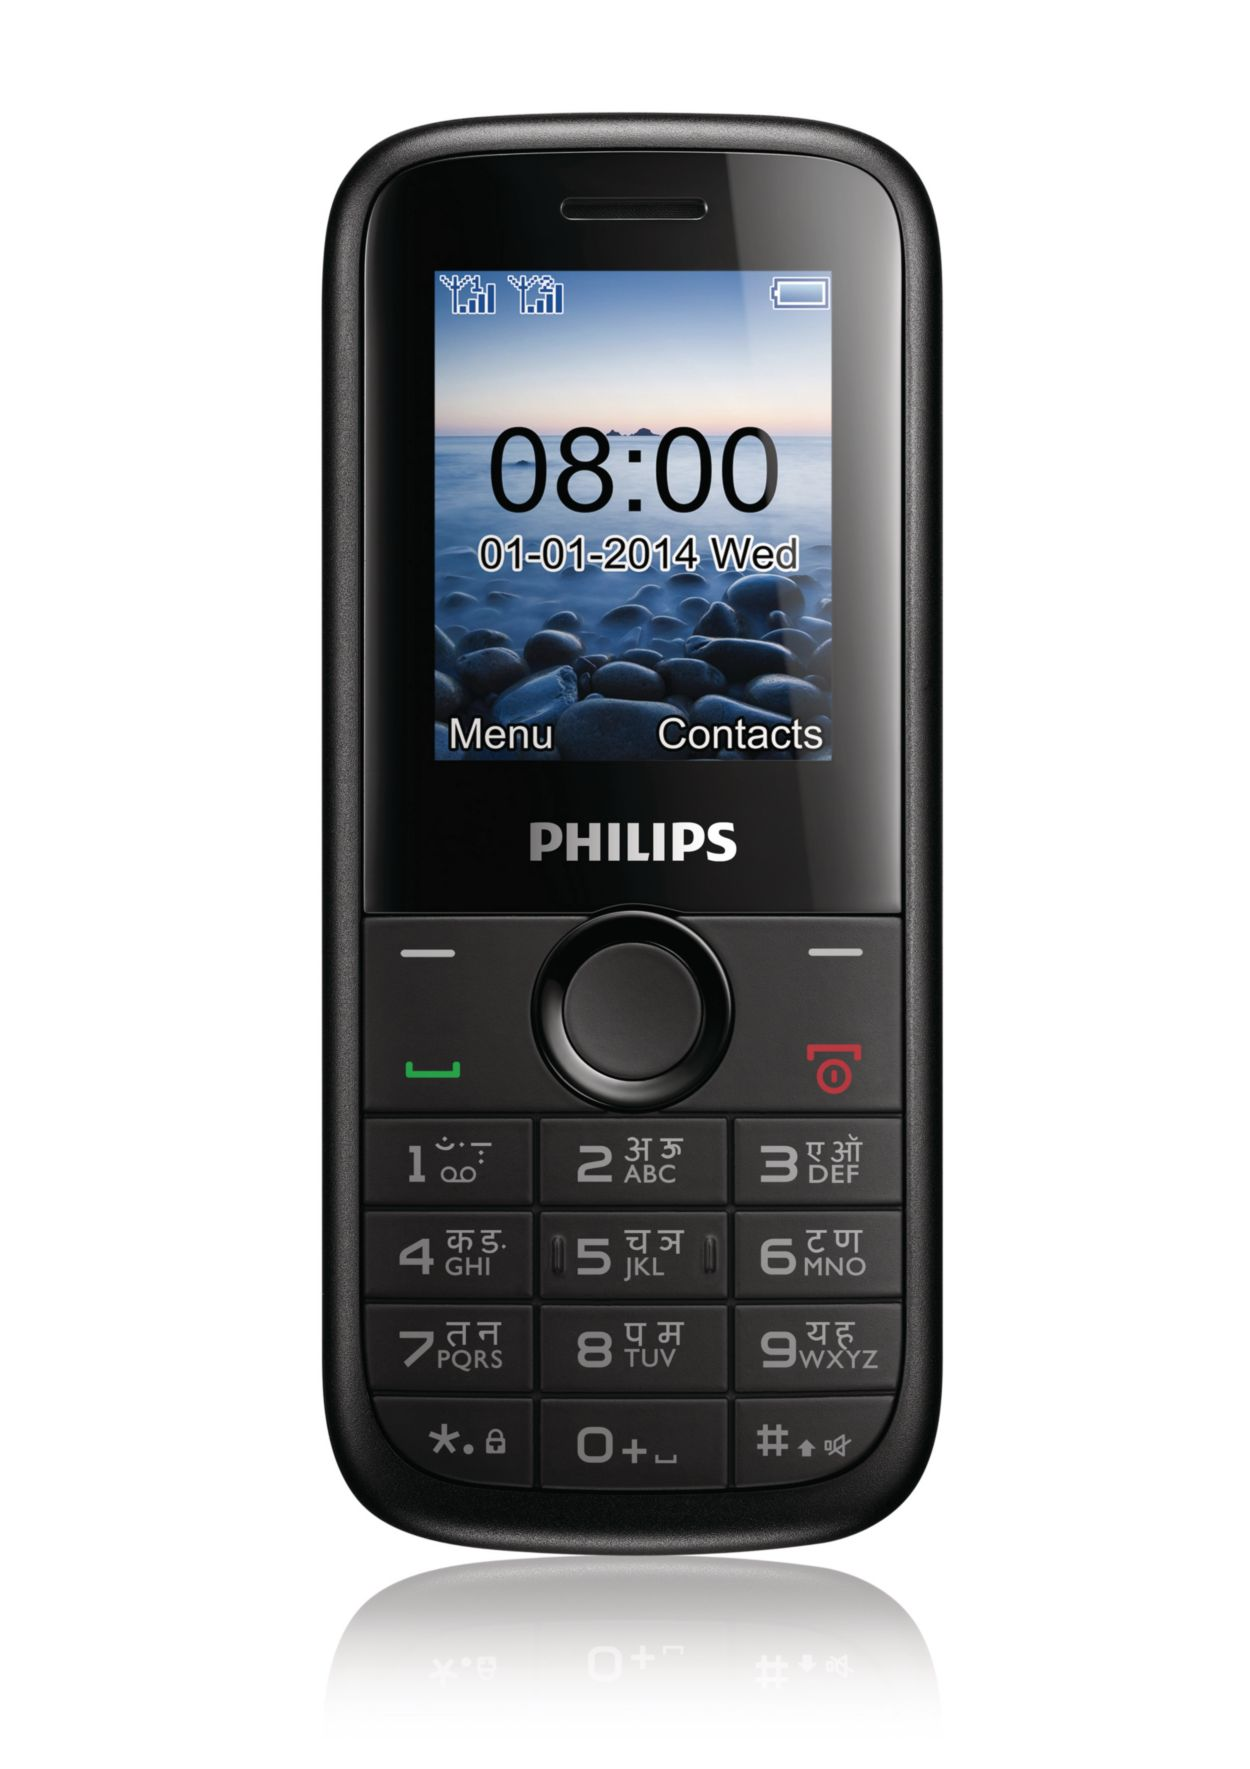 Buy the Philips Mobile Phone CTE1300BK/94 Mobile Phone